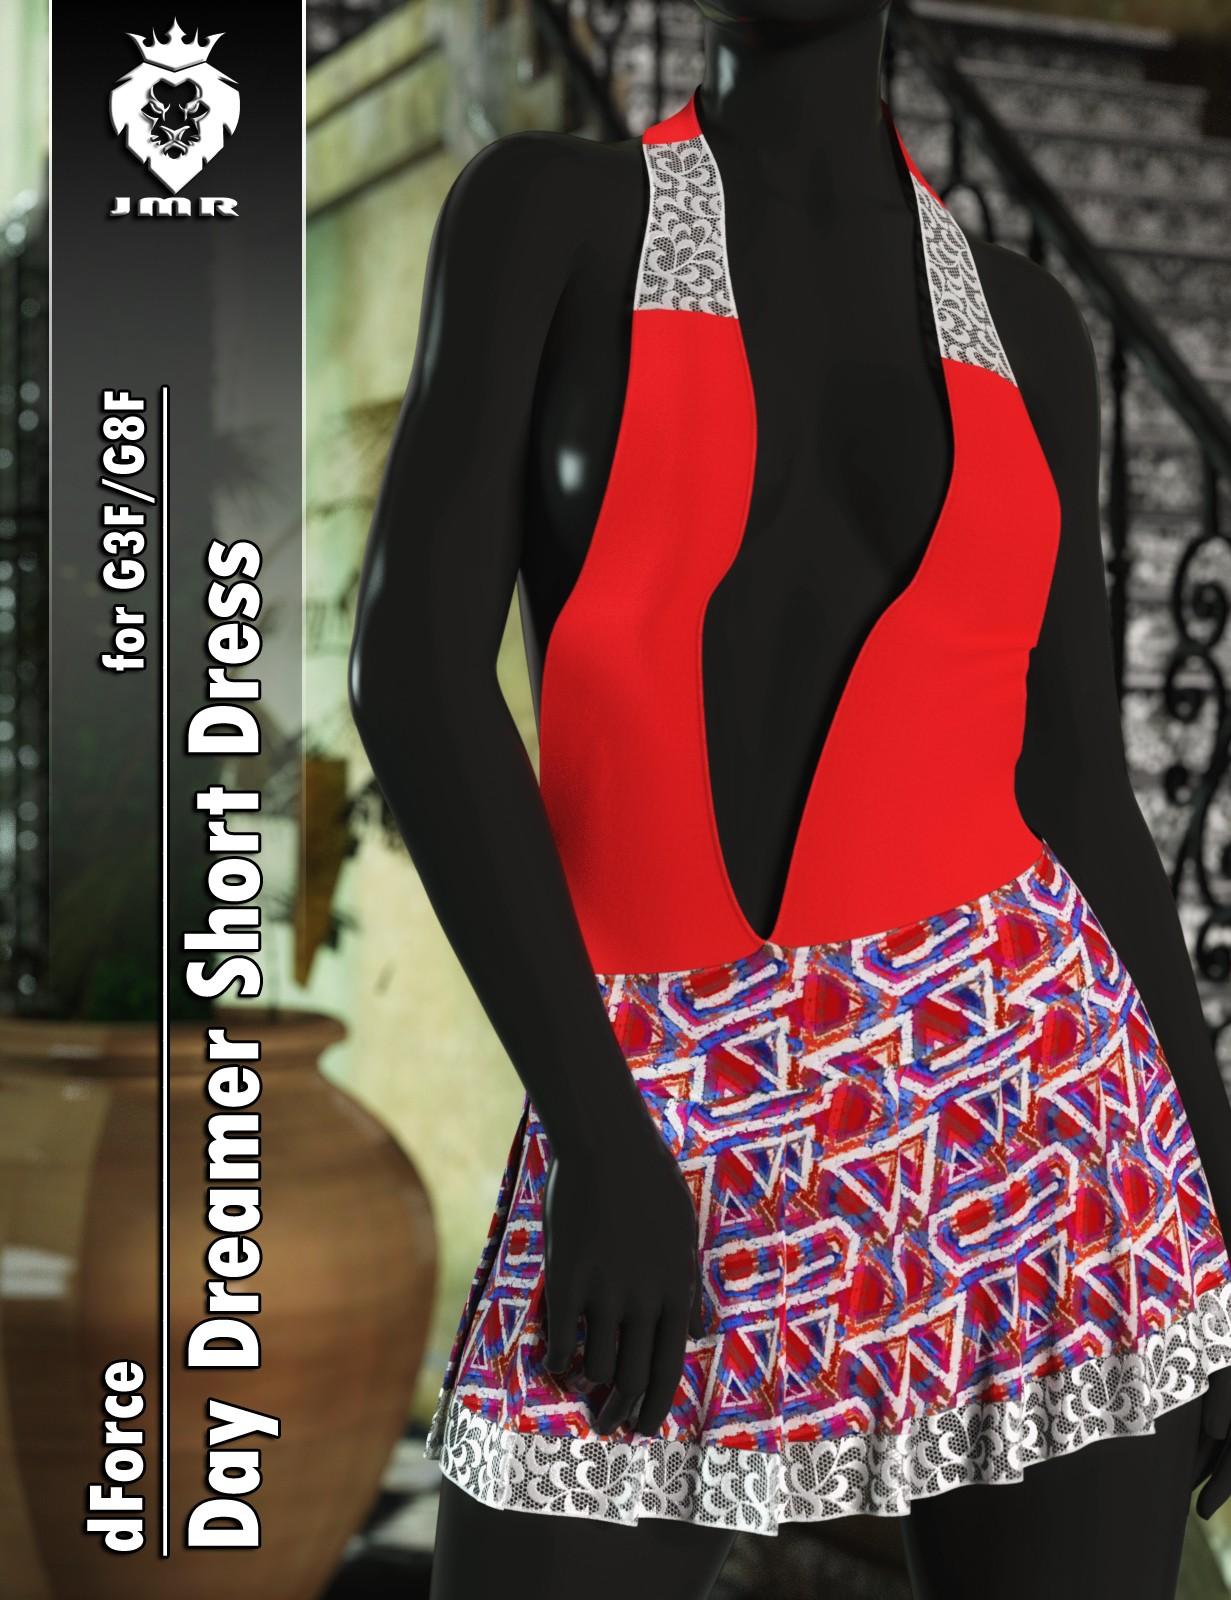 jmr-dforce-day-dreamer-short-dress-for-g3f-and-g8f